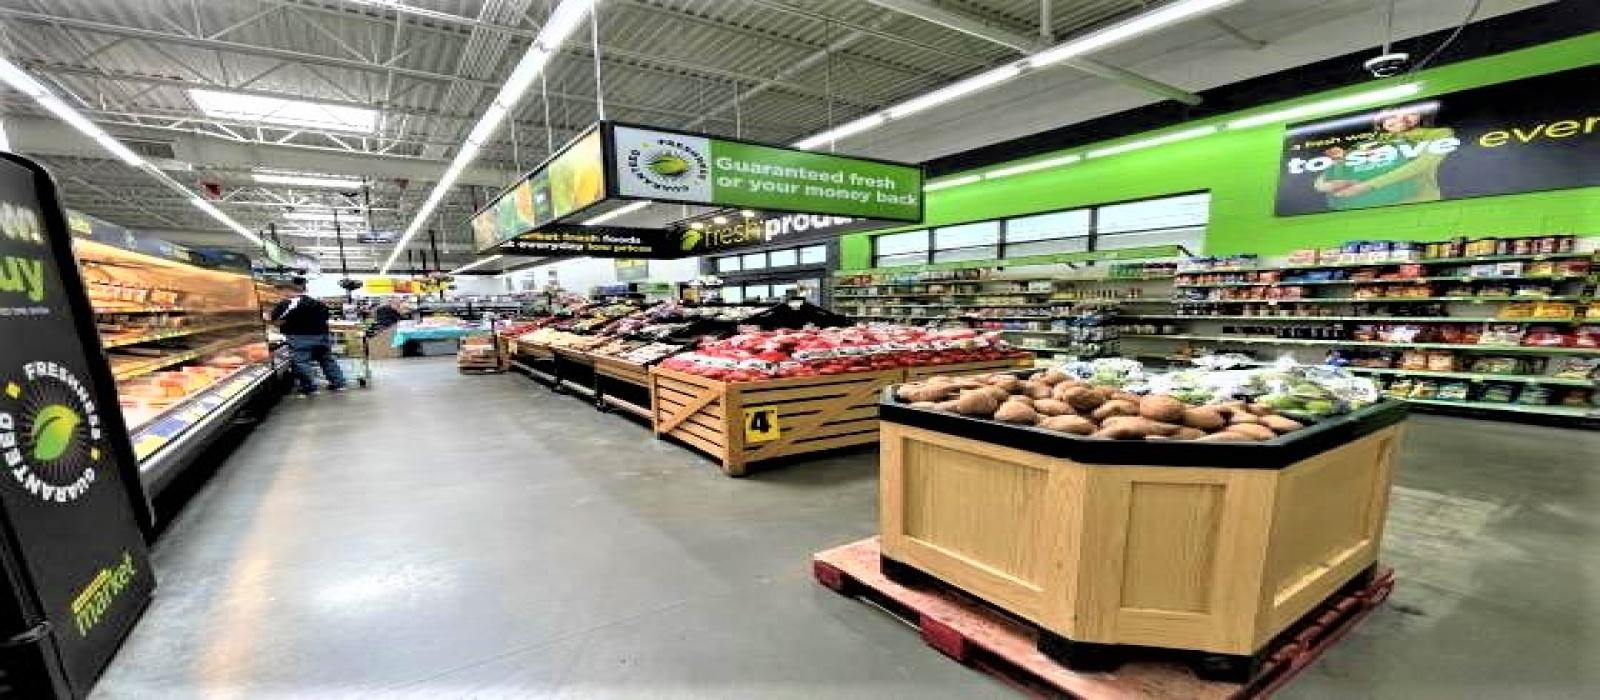 118 Tom Davis Road, Livingston, Tennessee 38570, ,Retail,For Sale,118 Tom Davis Road,1061